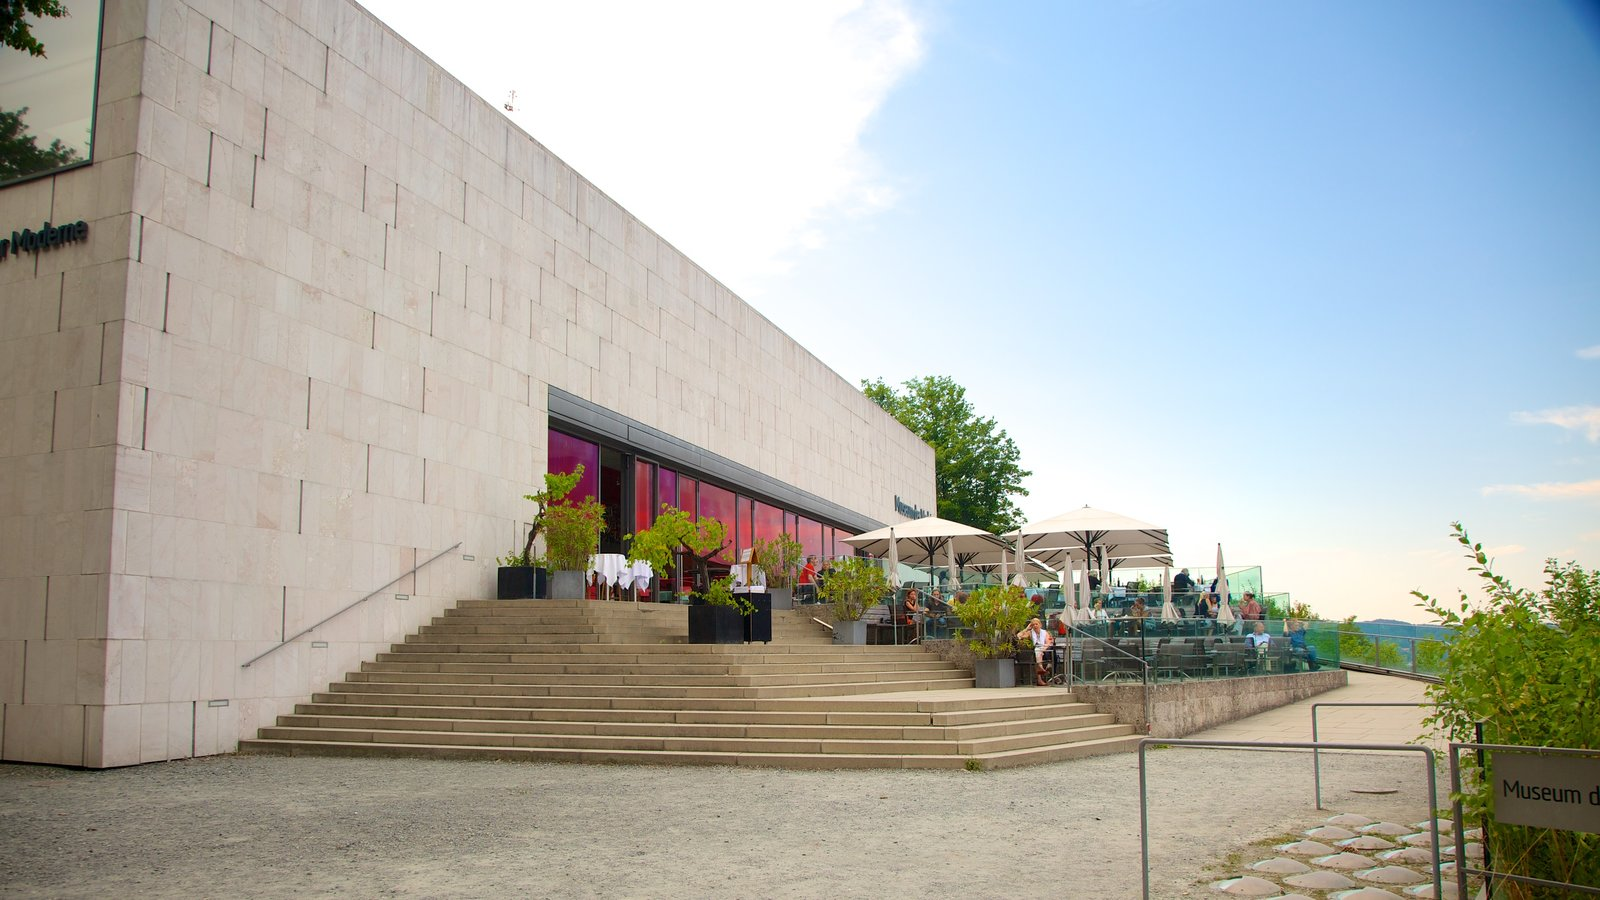 Museo de Arte Moderno Mönchsberg que incluye arquitectura moderna